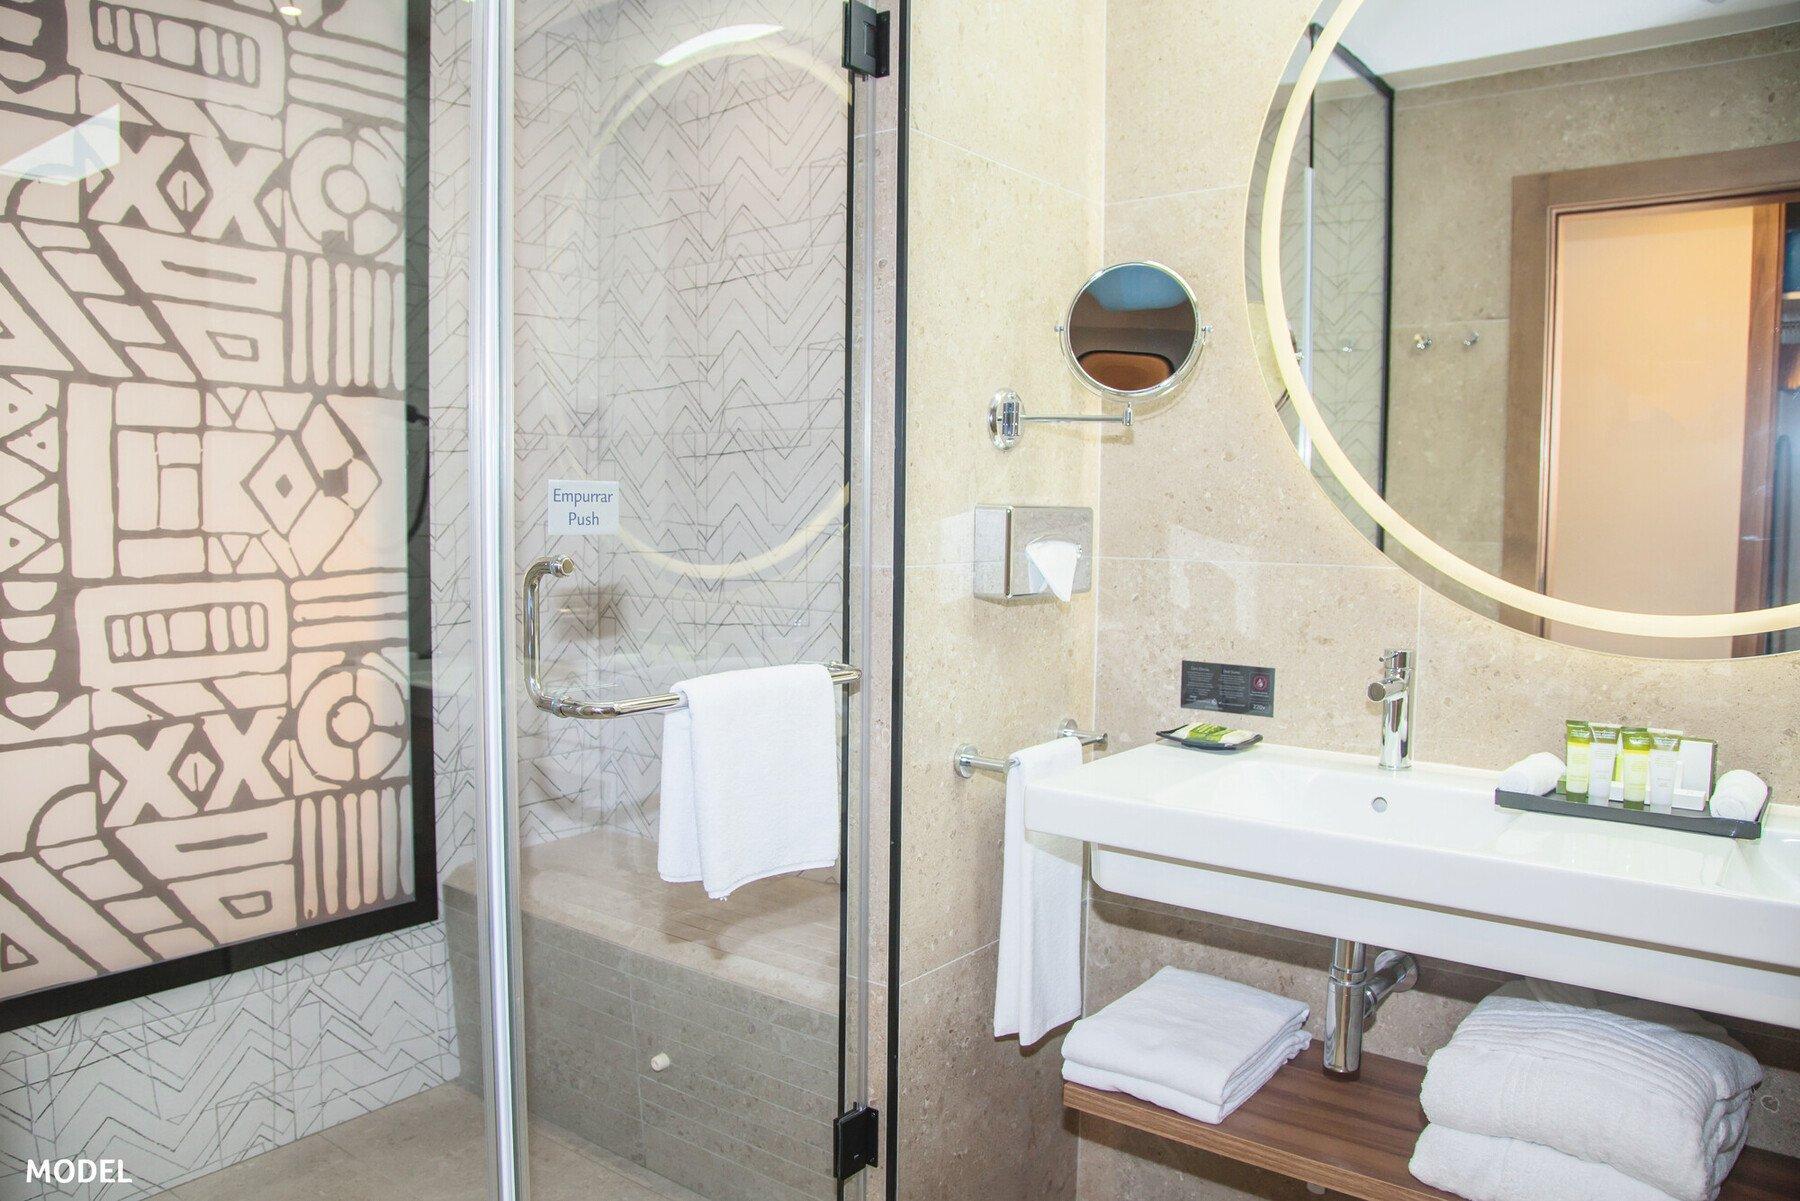 RIU Palace Santa Maria bathroom sample